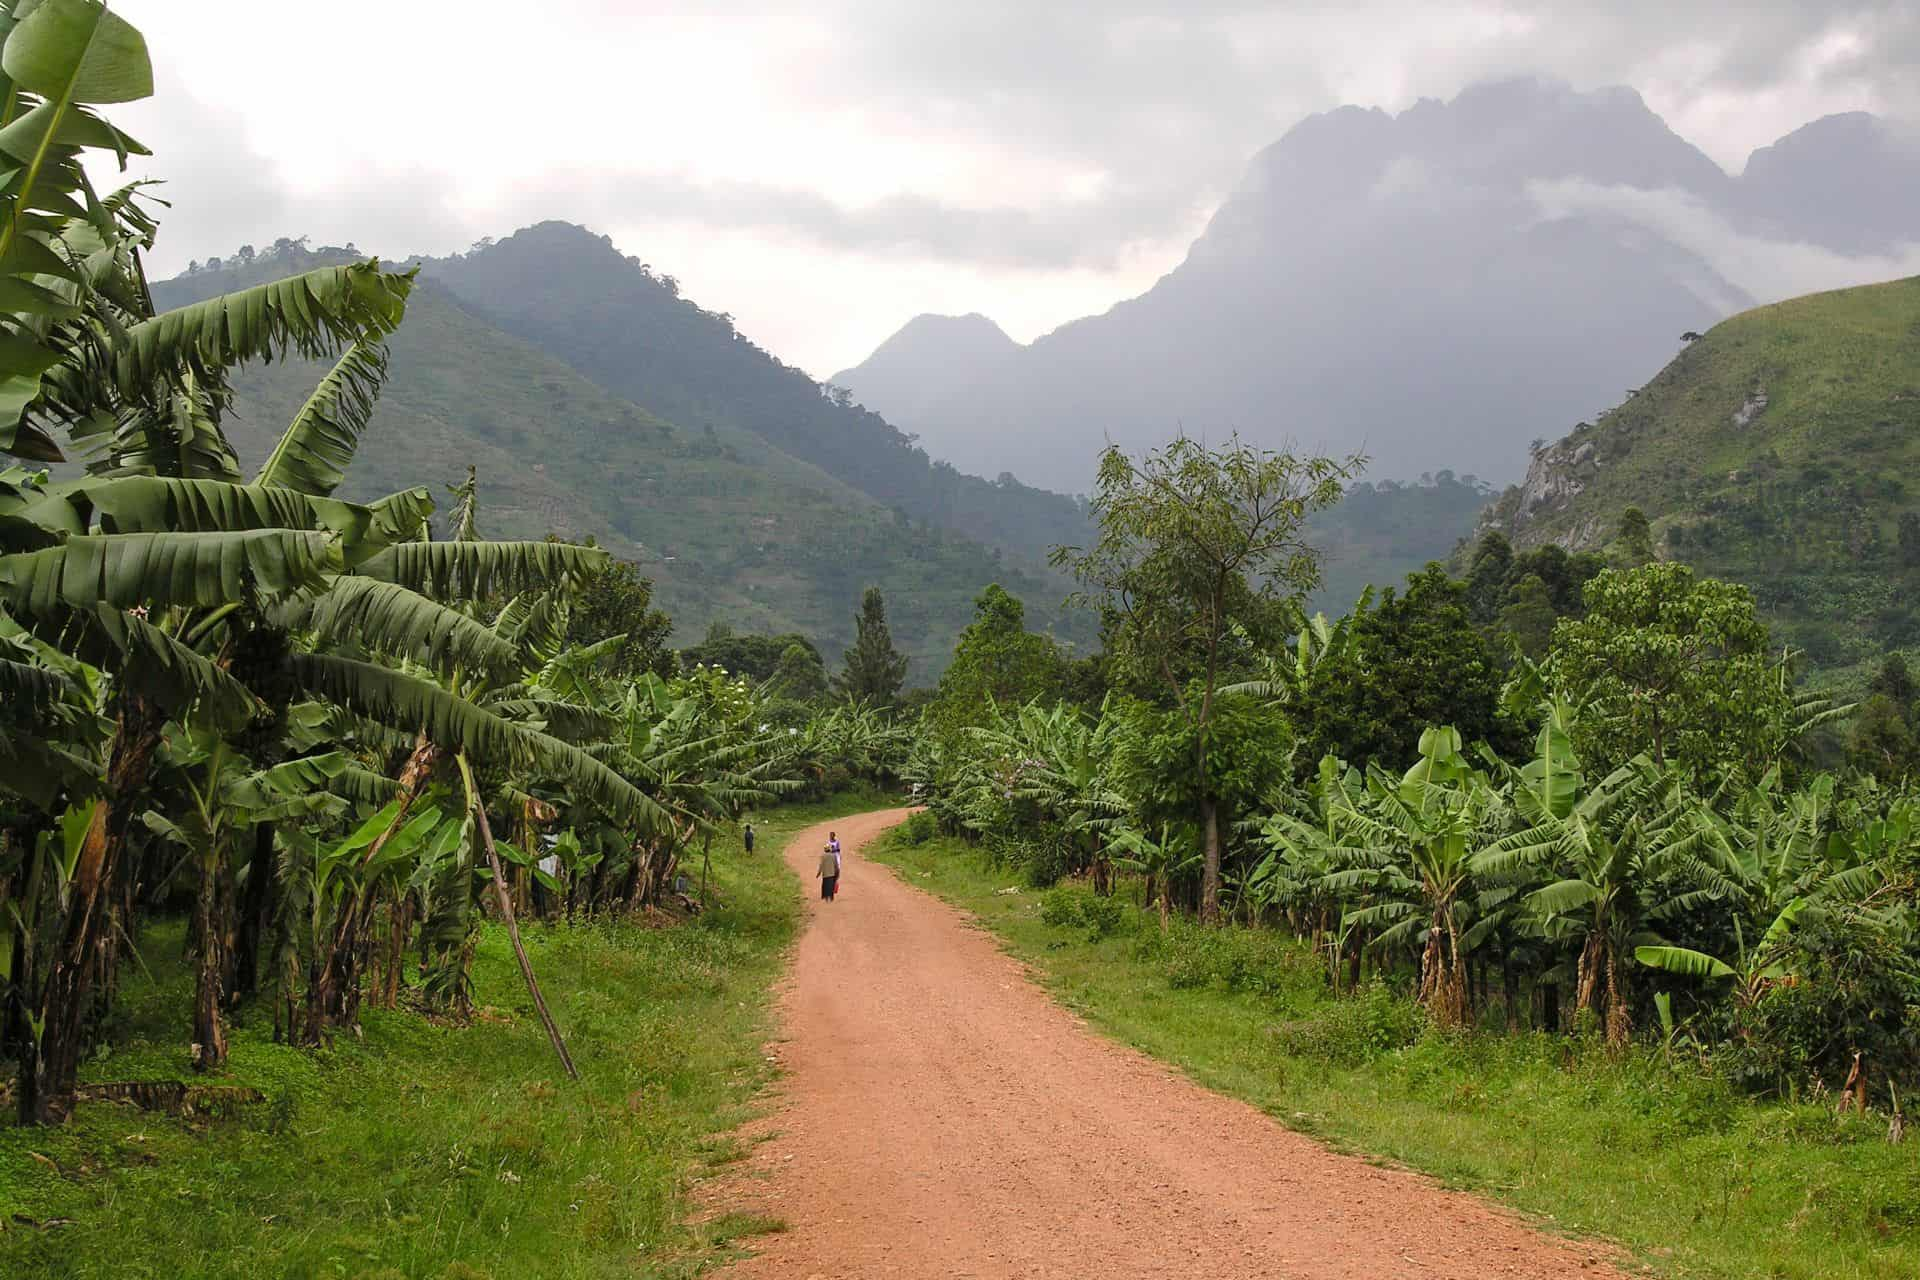 Rwenzori Mountain Ranges